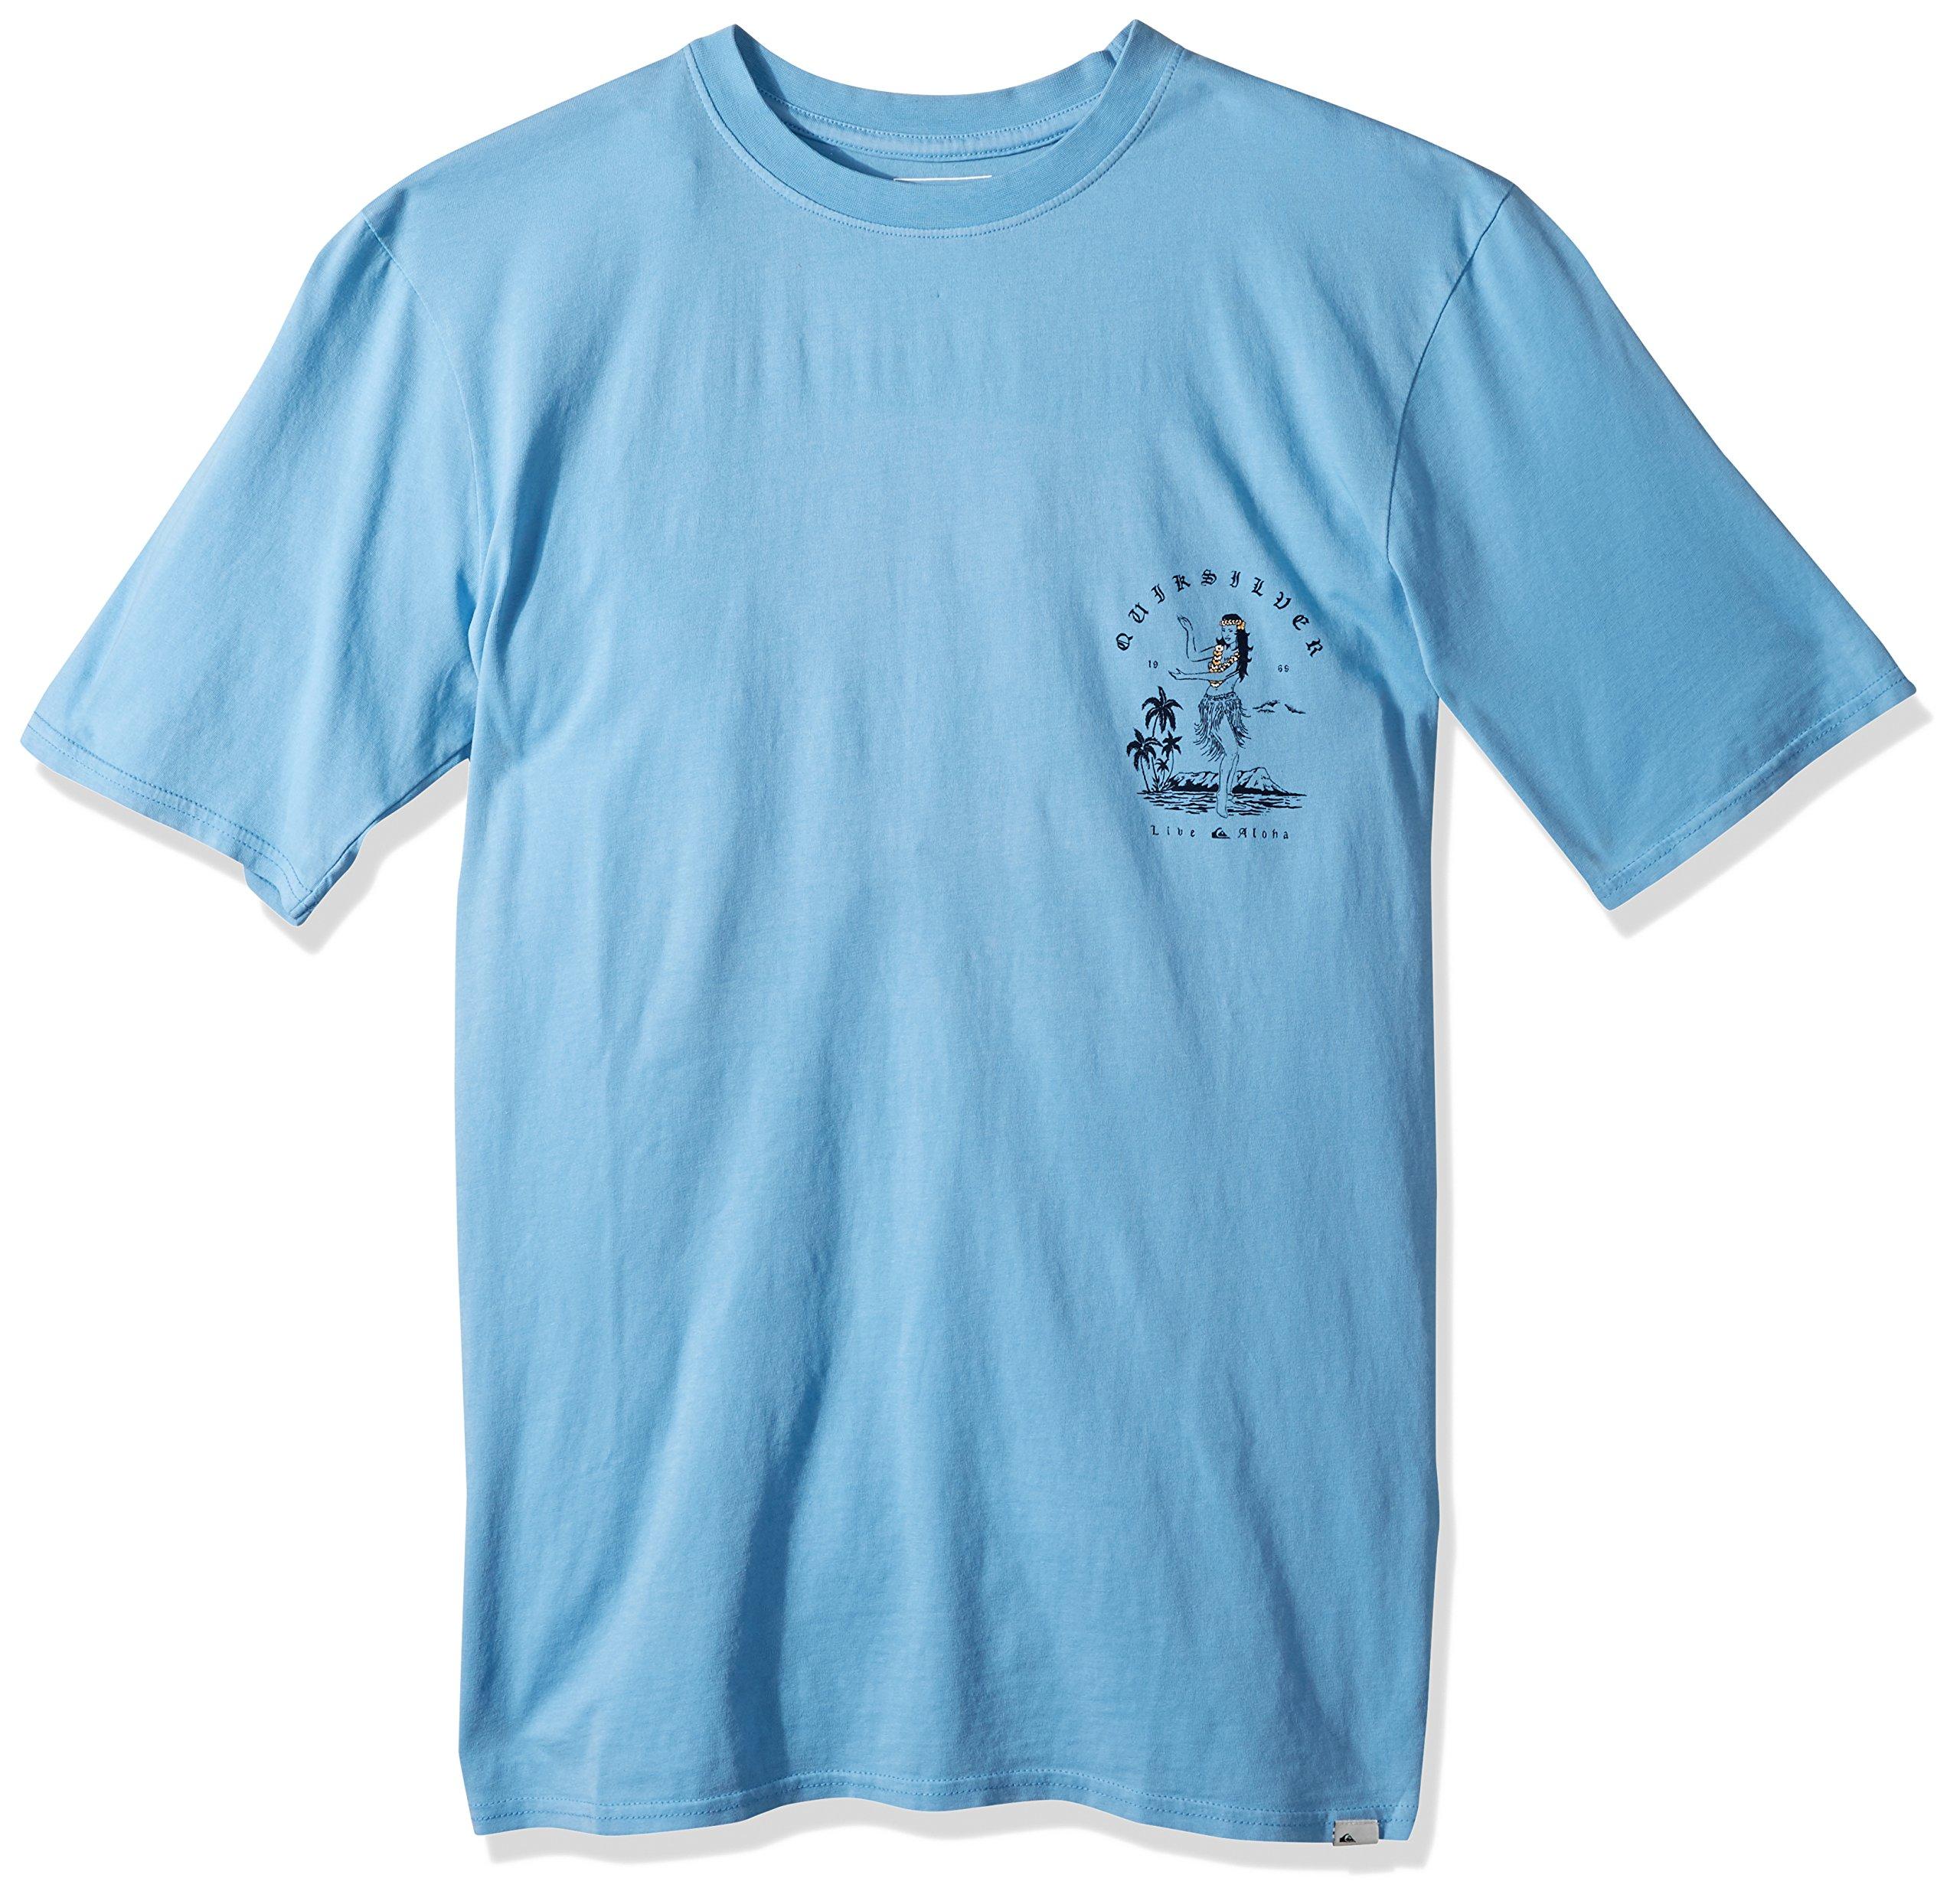 Quiksilver Men's Short Sleeve GMT Dye Curve Love, Silver Lake Blue, XL by Quiksilver (Image #1)